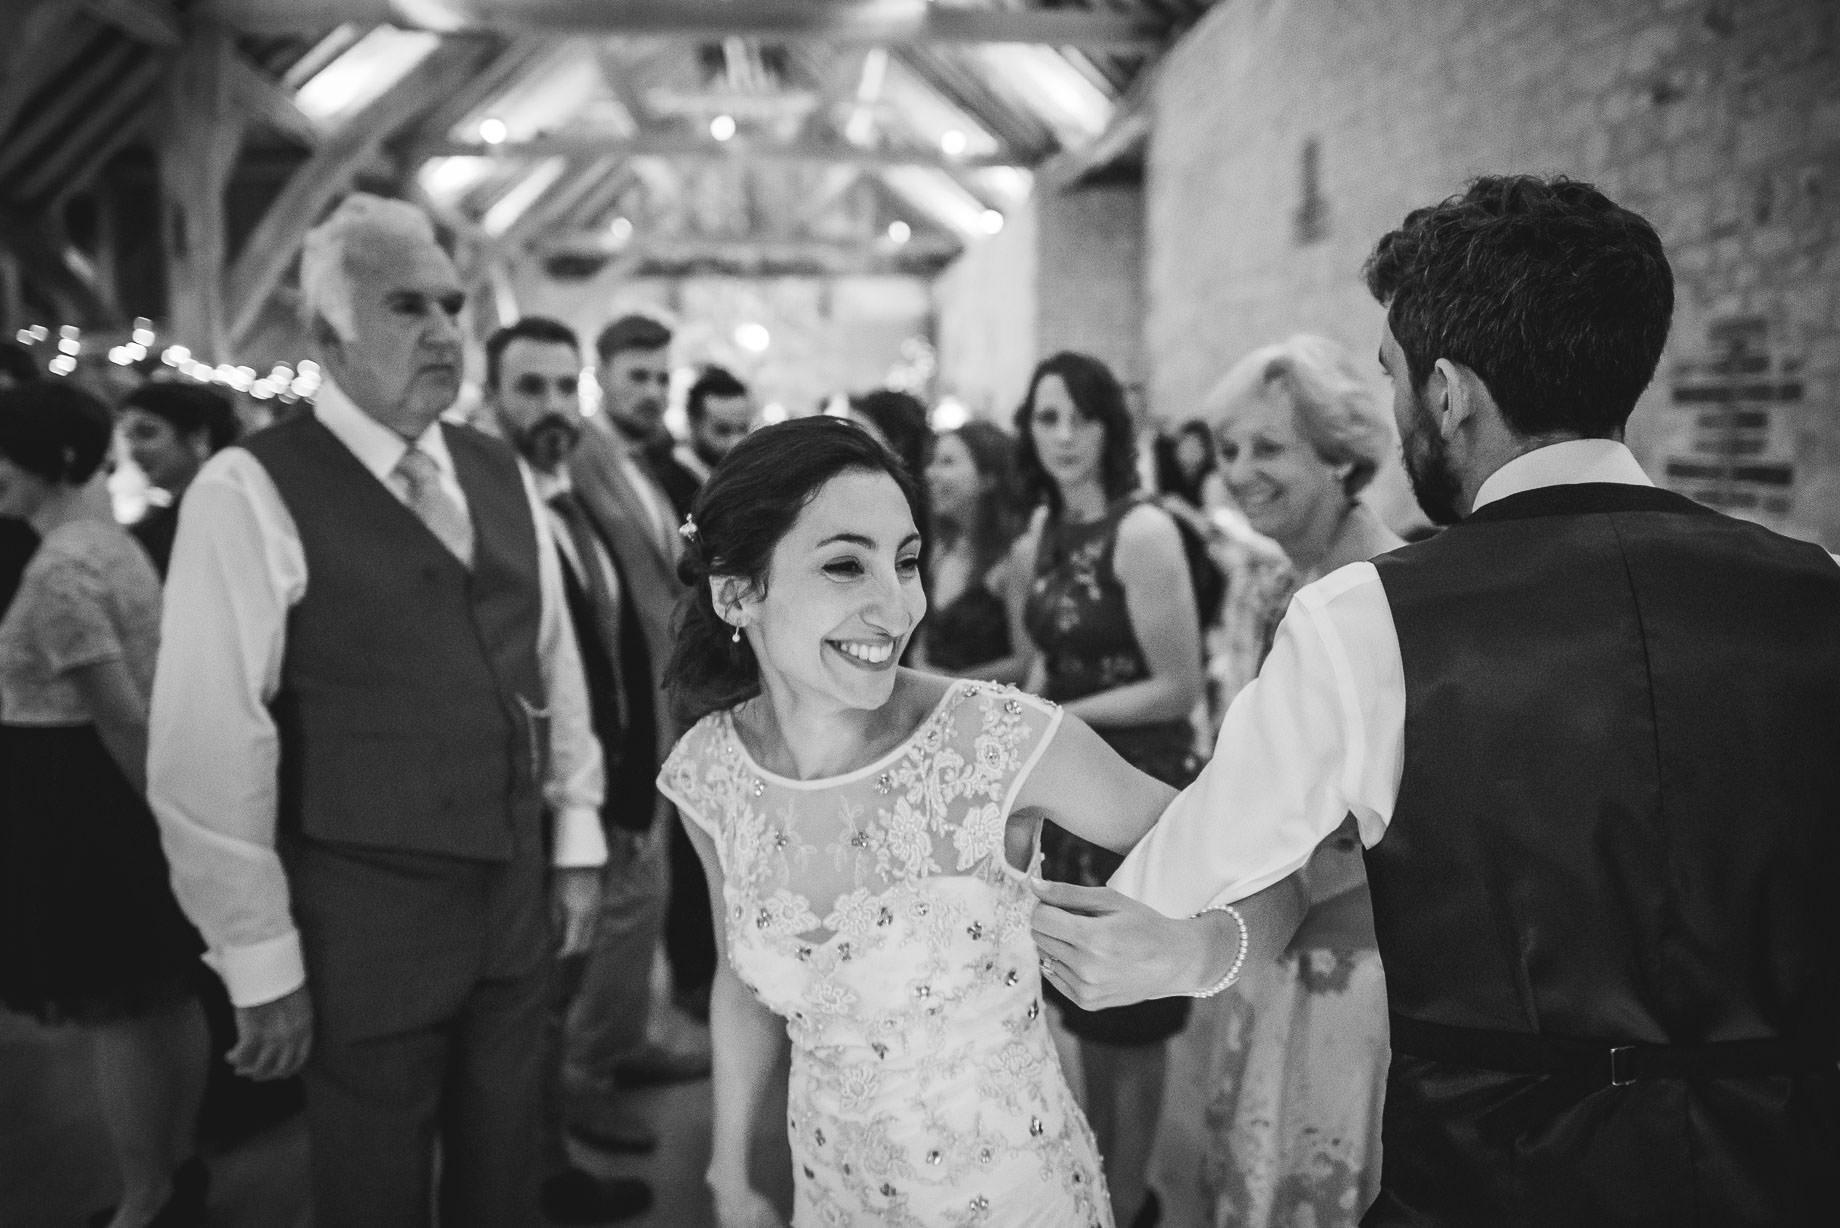 bury-court-barn-wedding-photography-guy-collier-photography-nadia-tom-173-of-184